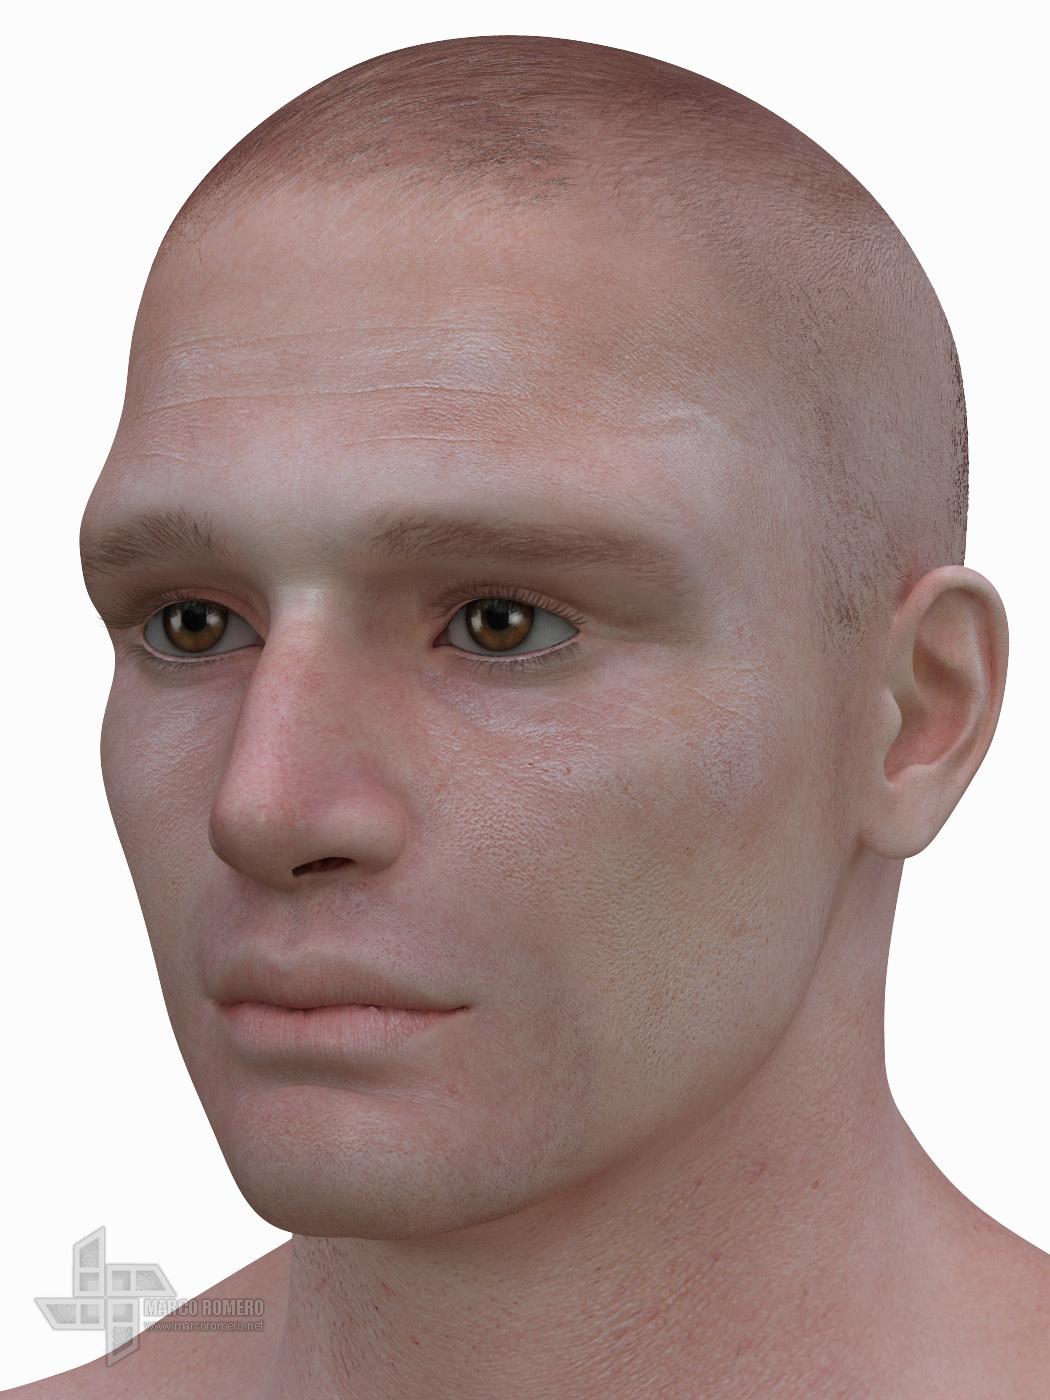 Maromero 3d male character 1 8ba92503 v6x8